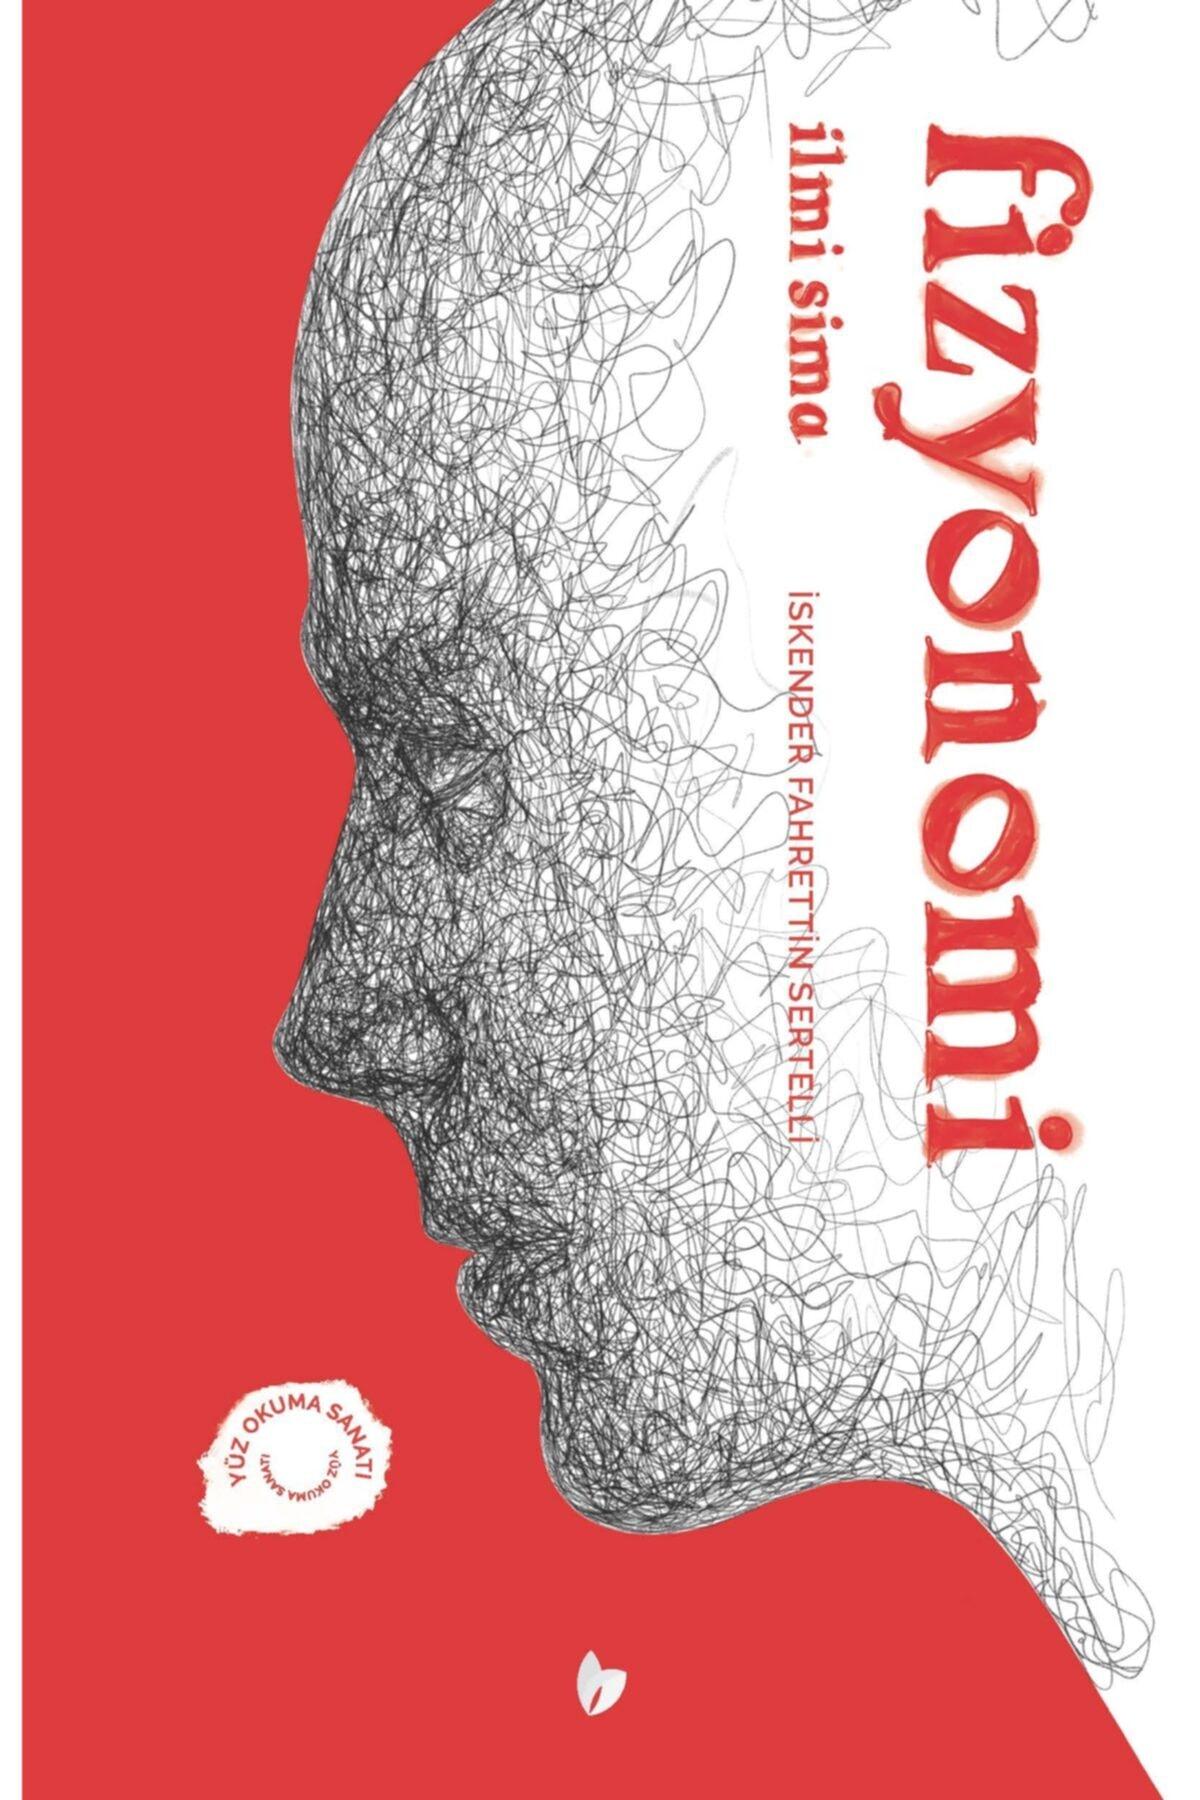 Buğday Kitap Fizyonomi Ilmi Sima - Iskender Fahrettin Sertelli 1